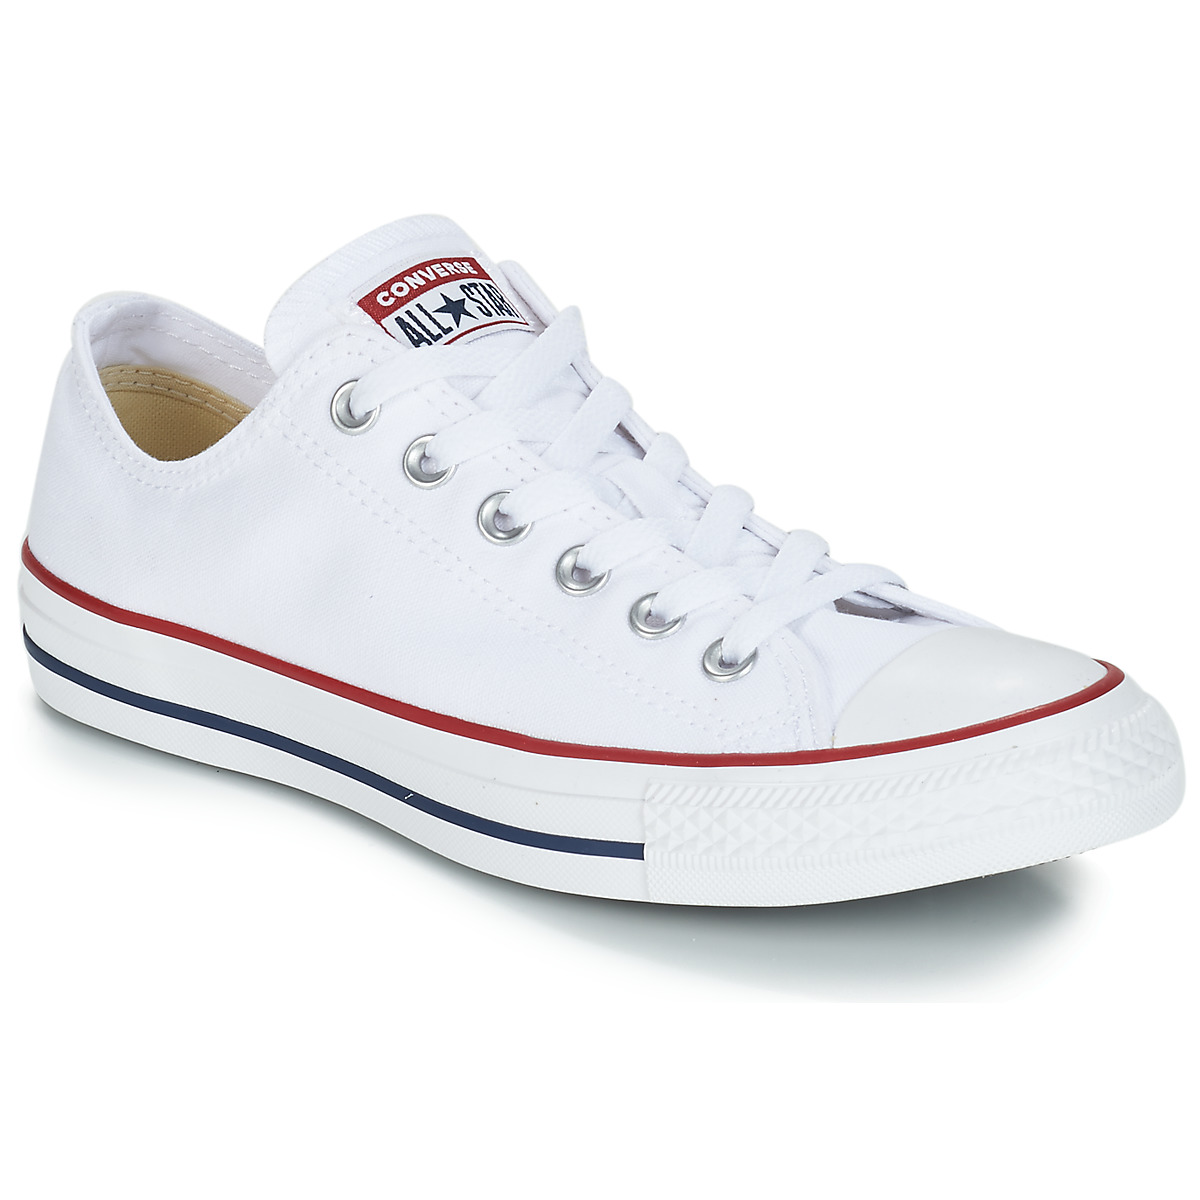 Converse CHUCK TAYLOR ALL STAR CORE OX White